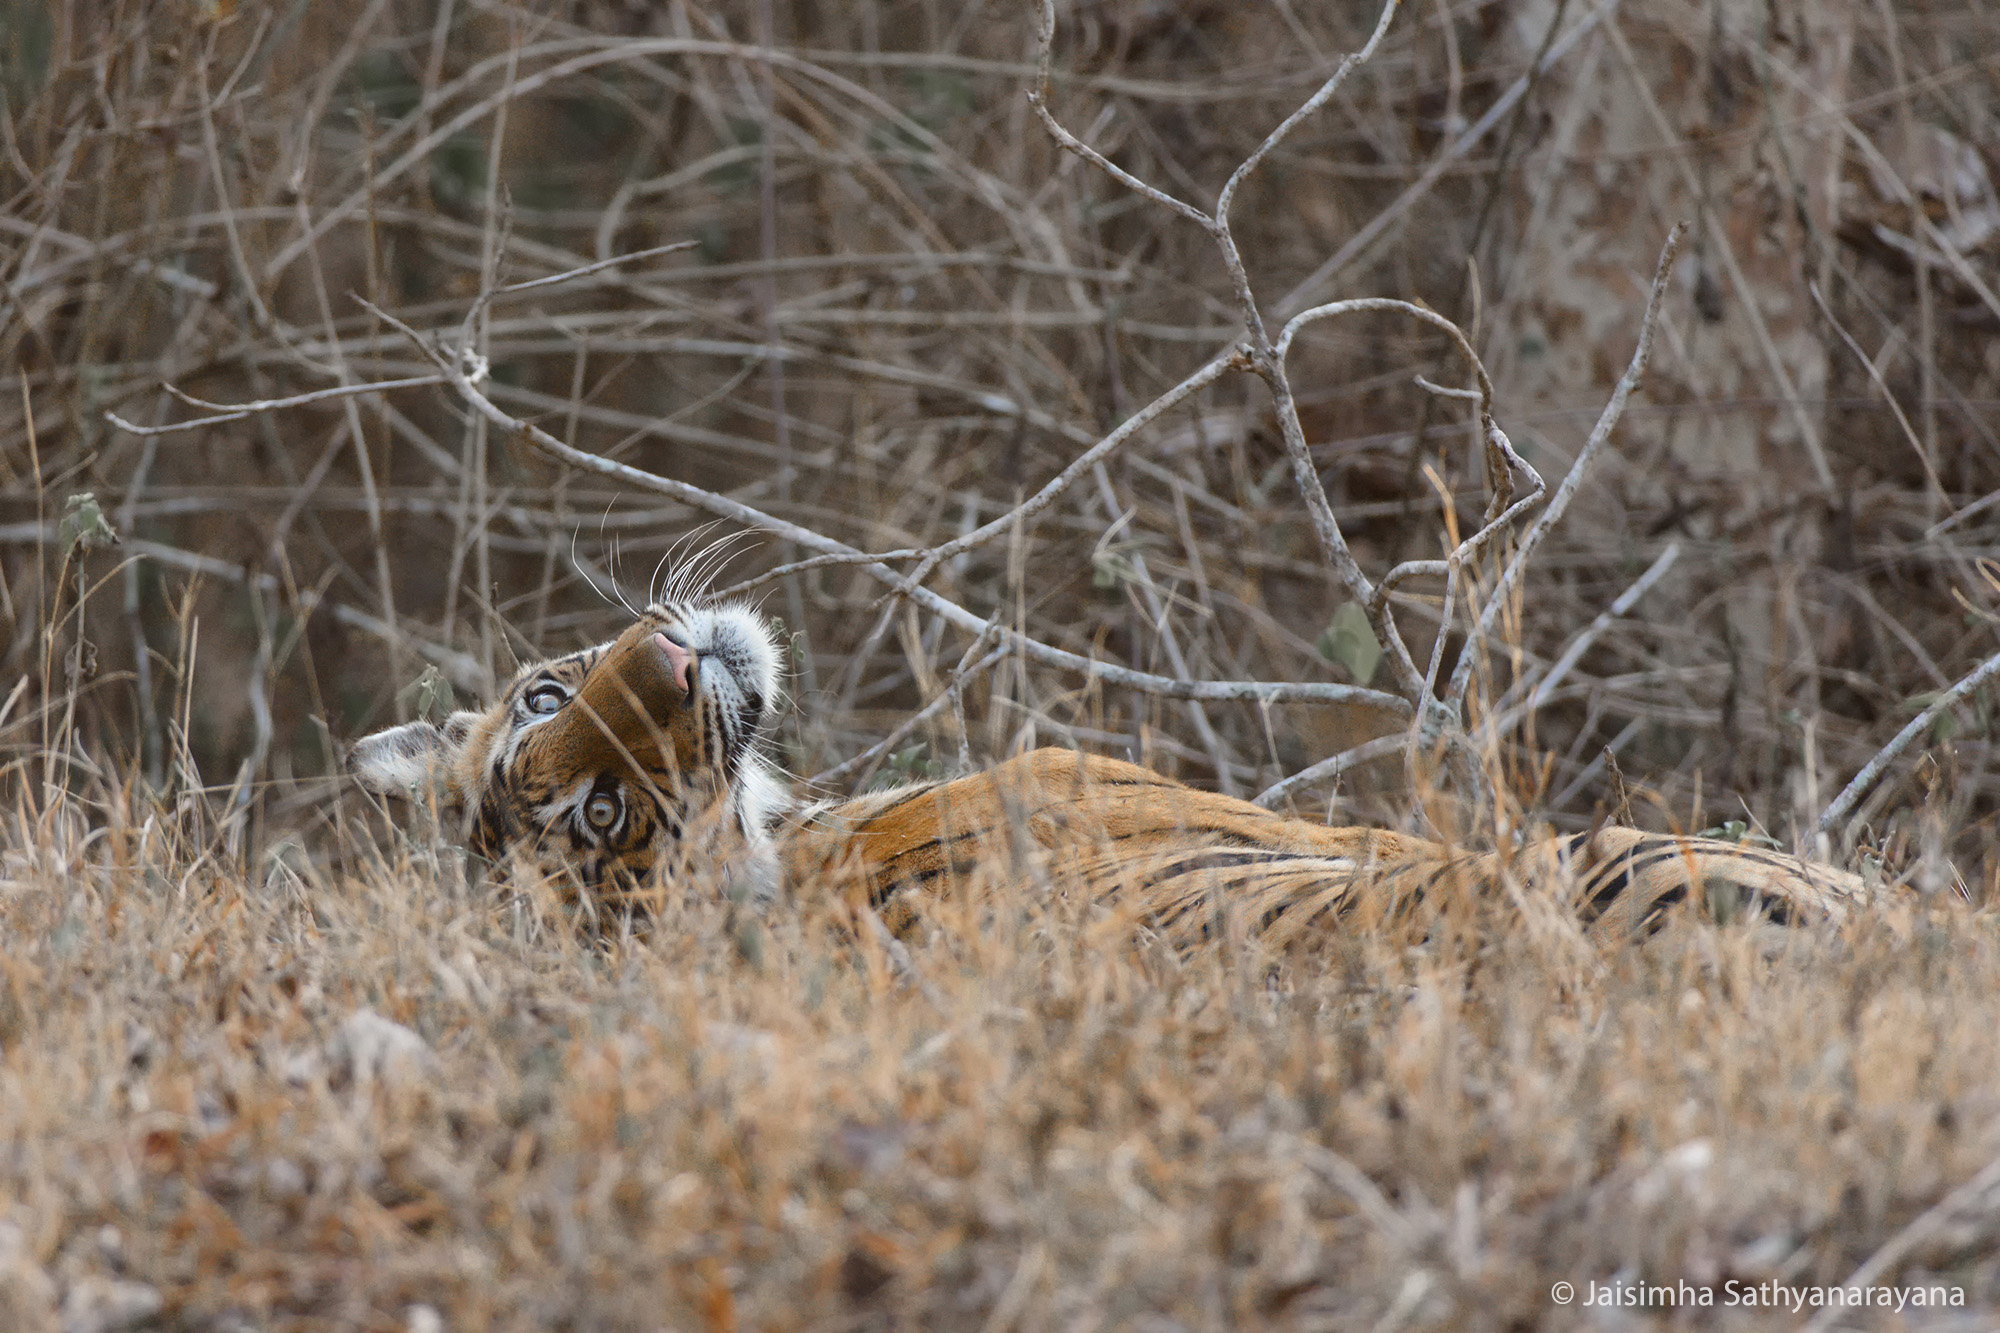 Tiger, Jaisimha Sathyanarayana